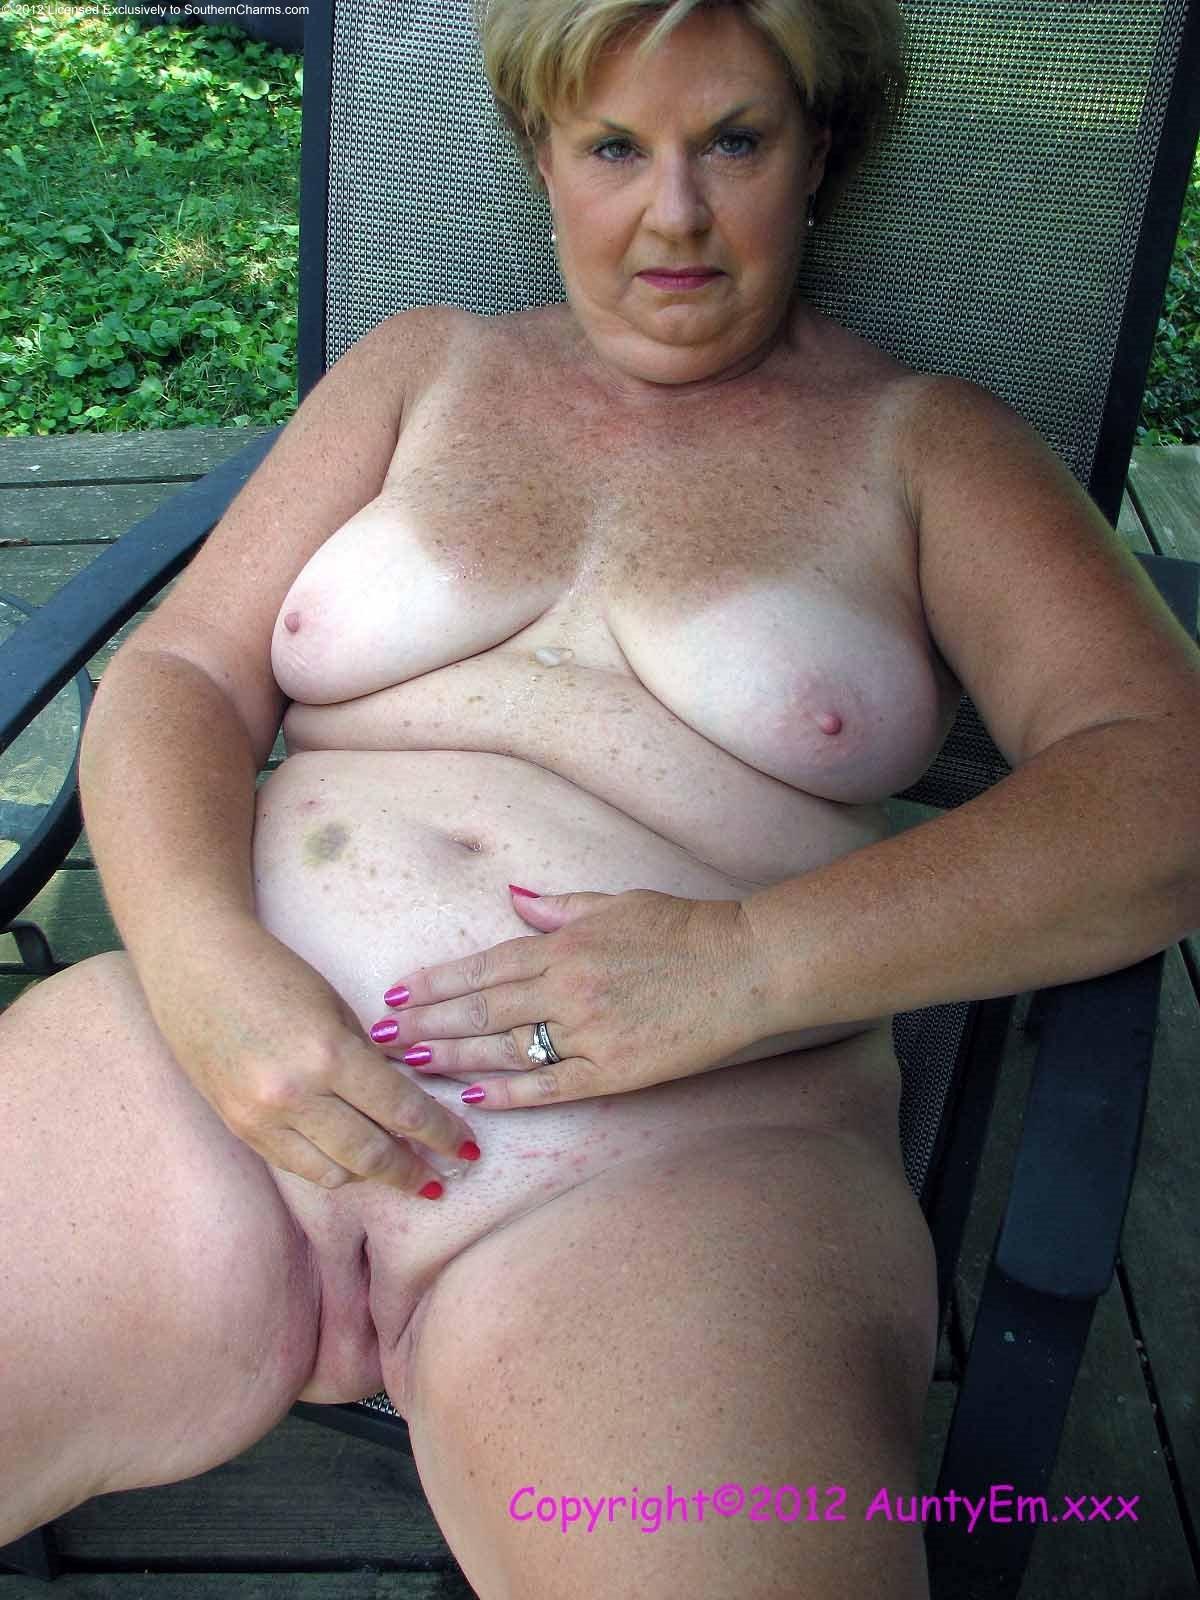 softcore nude women porn